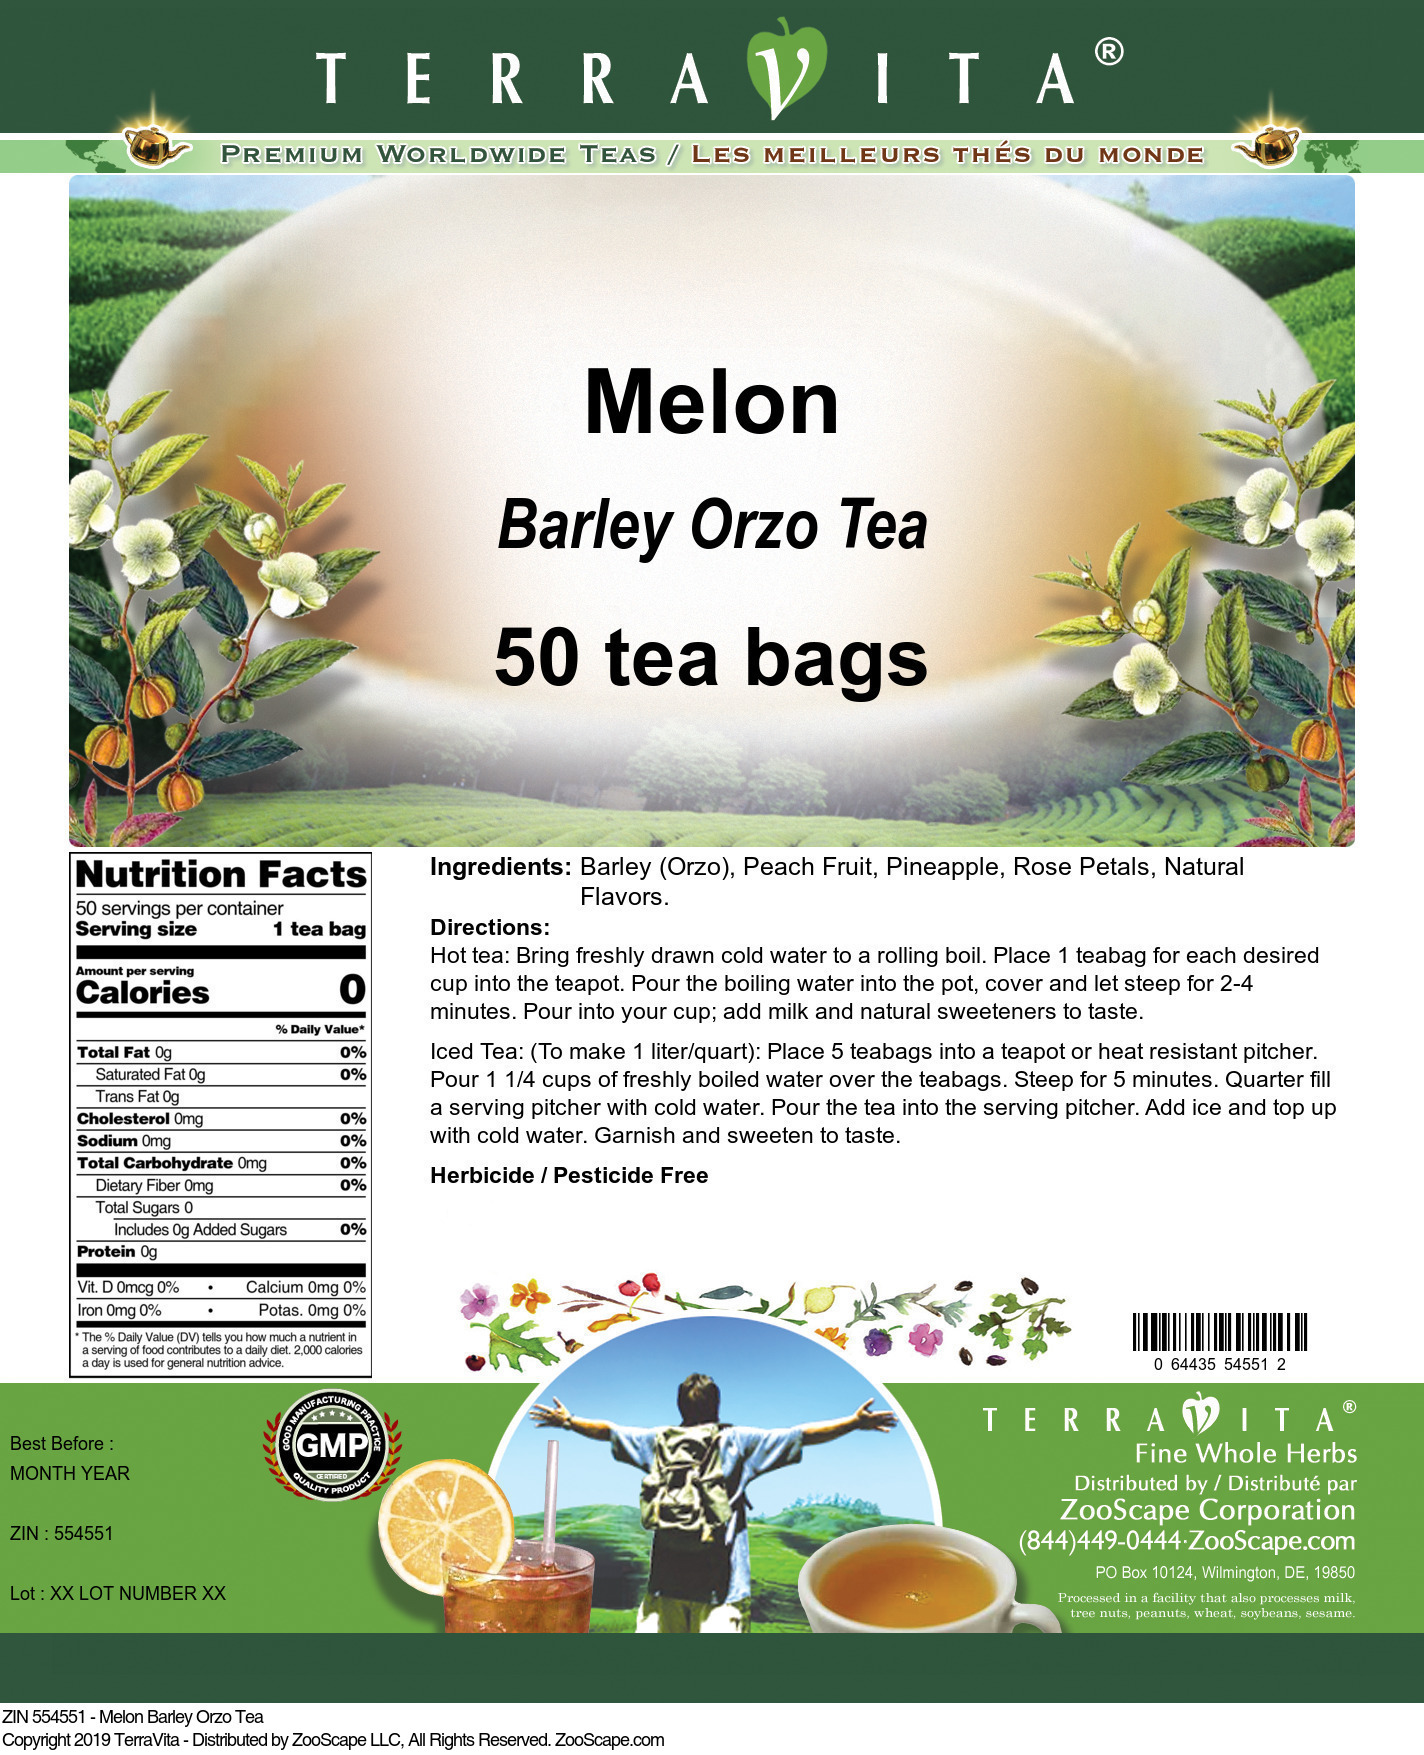 Melon Barley Orzo Tea